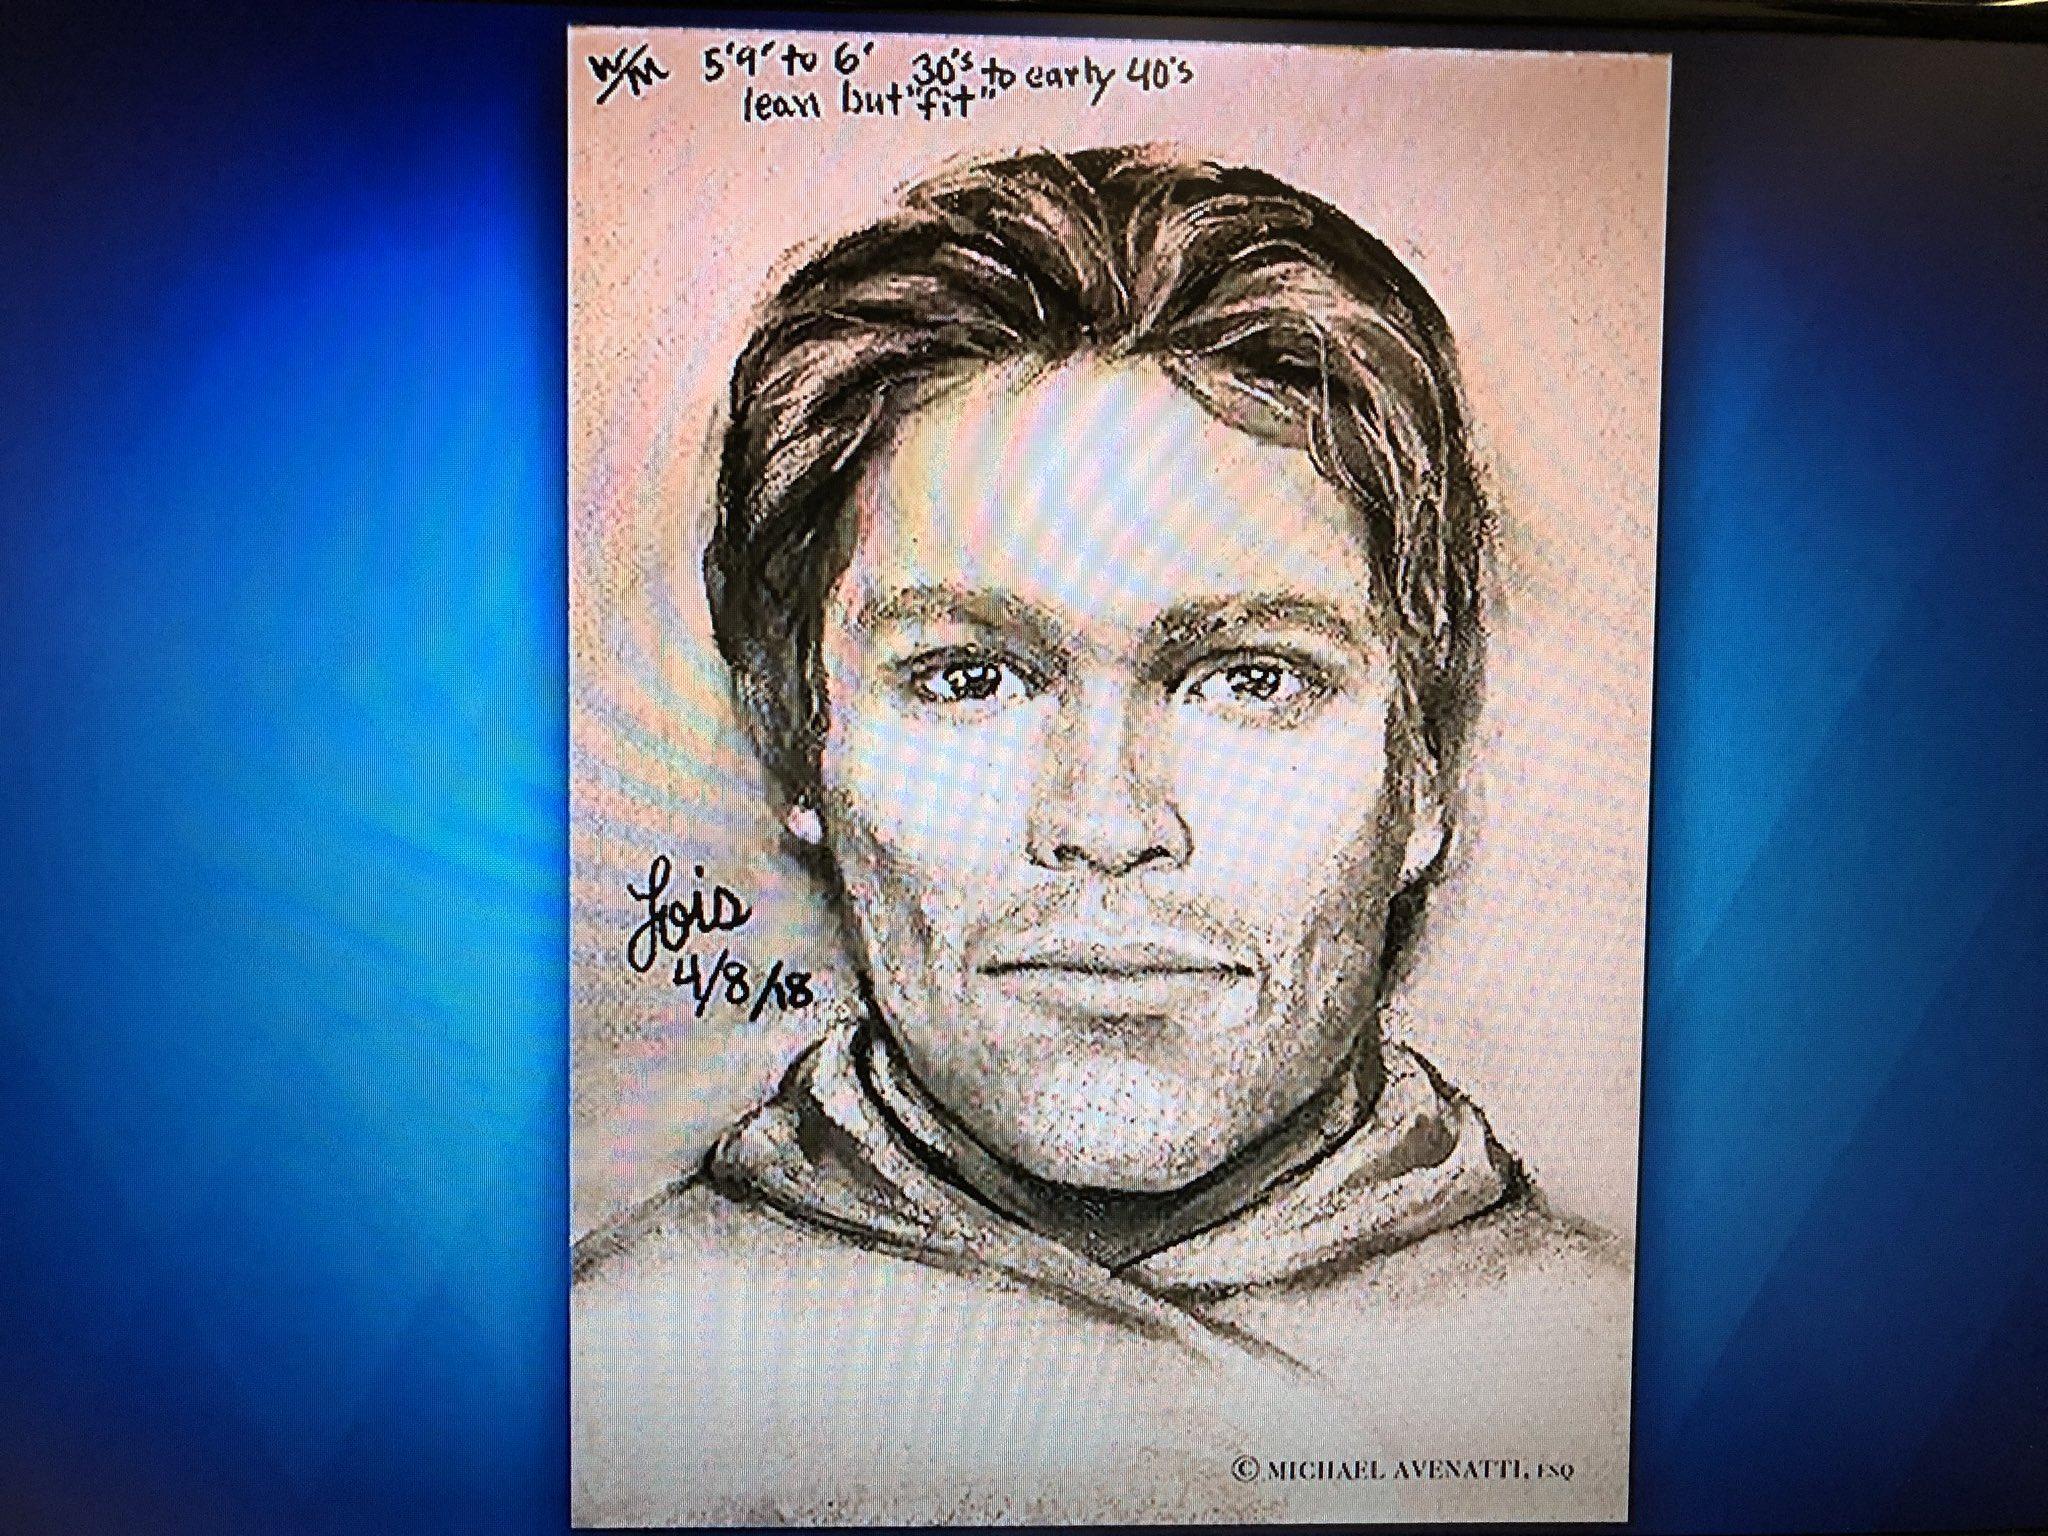 Stormy Daniels reveals sketch of man who allegedly threatened her over Trump story. https://t.co/lMJsoPkQAd https://t.co/zivJviJesg